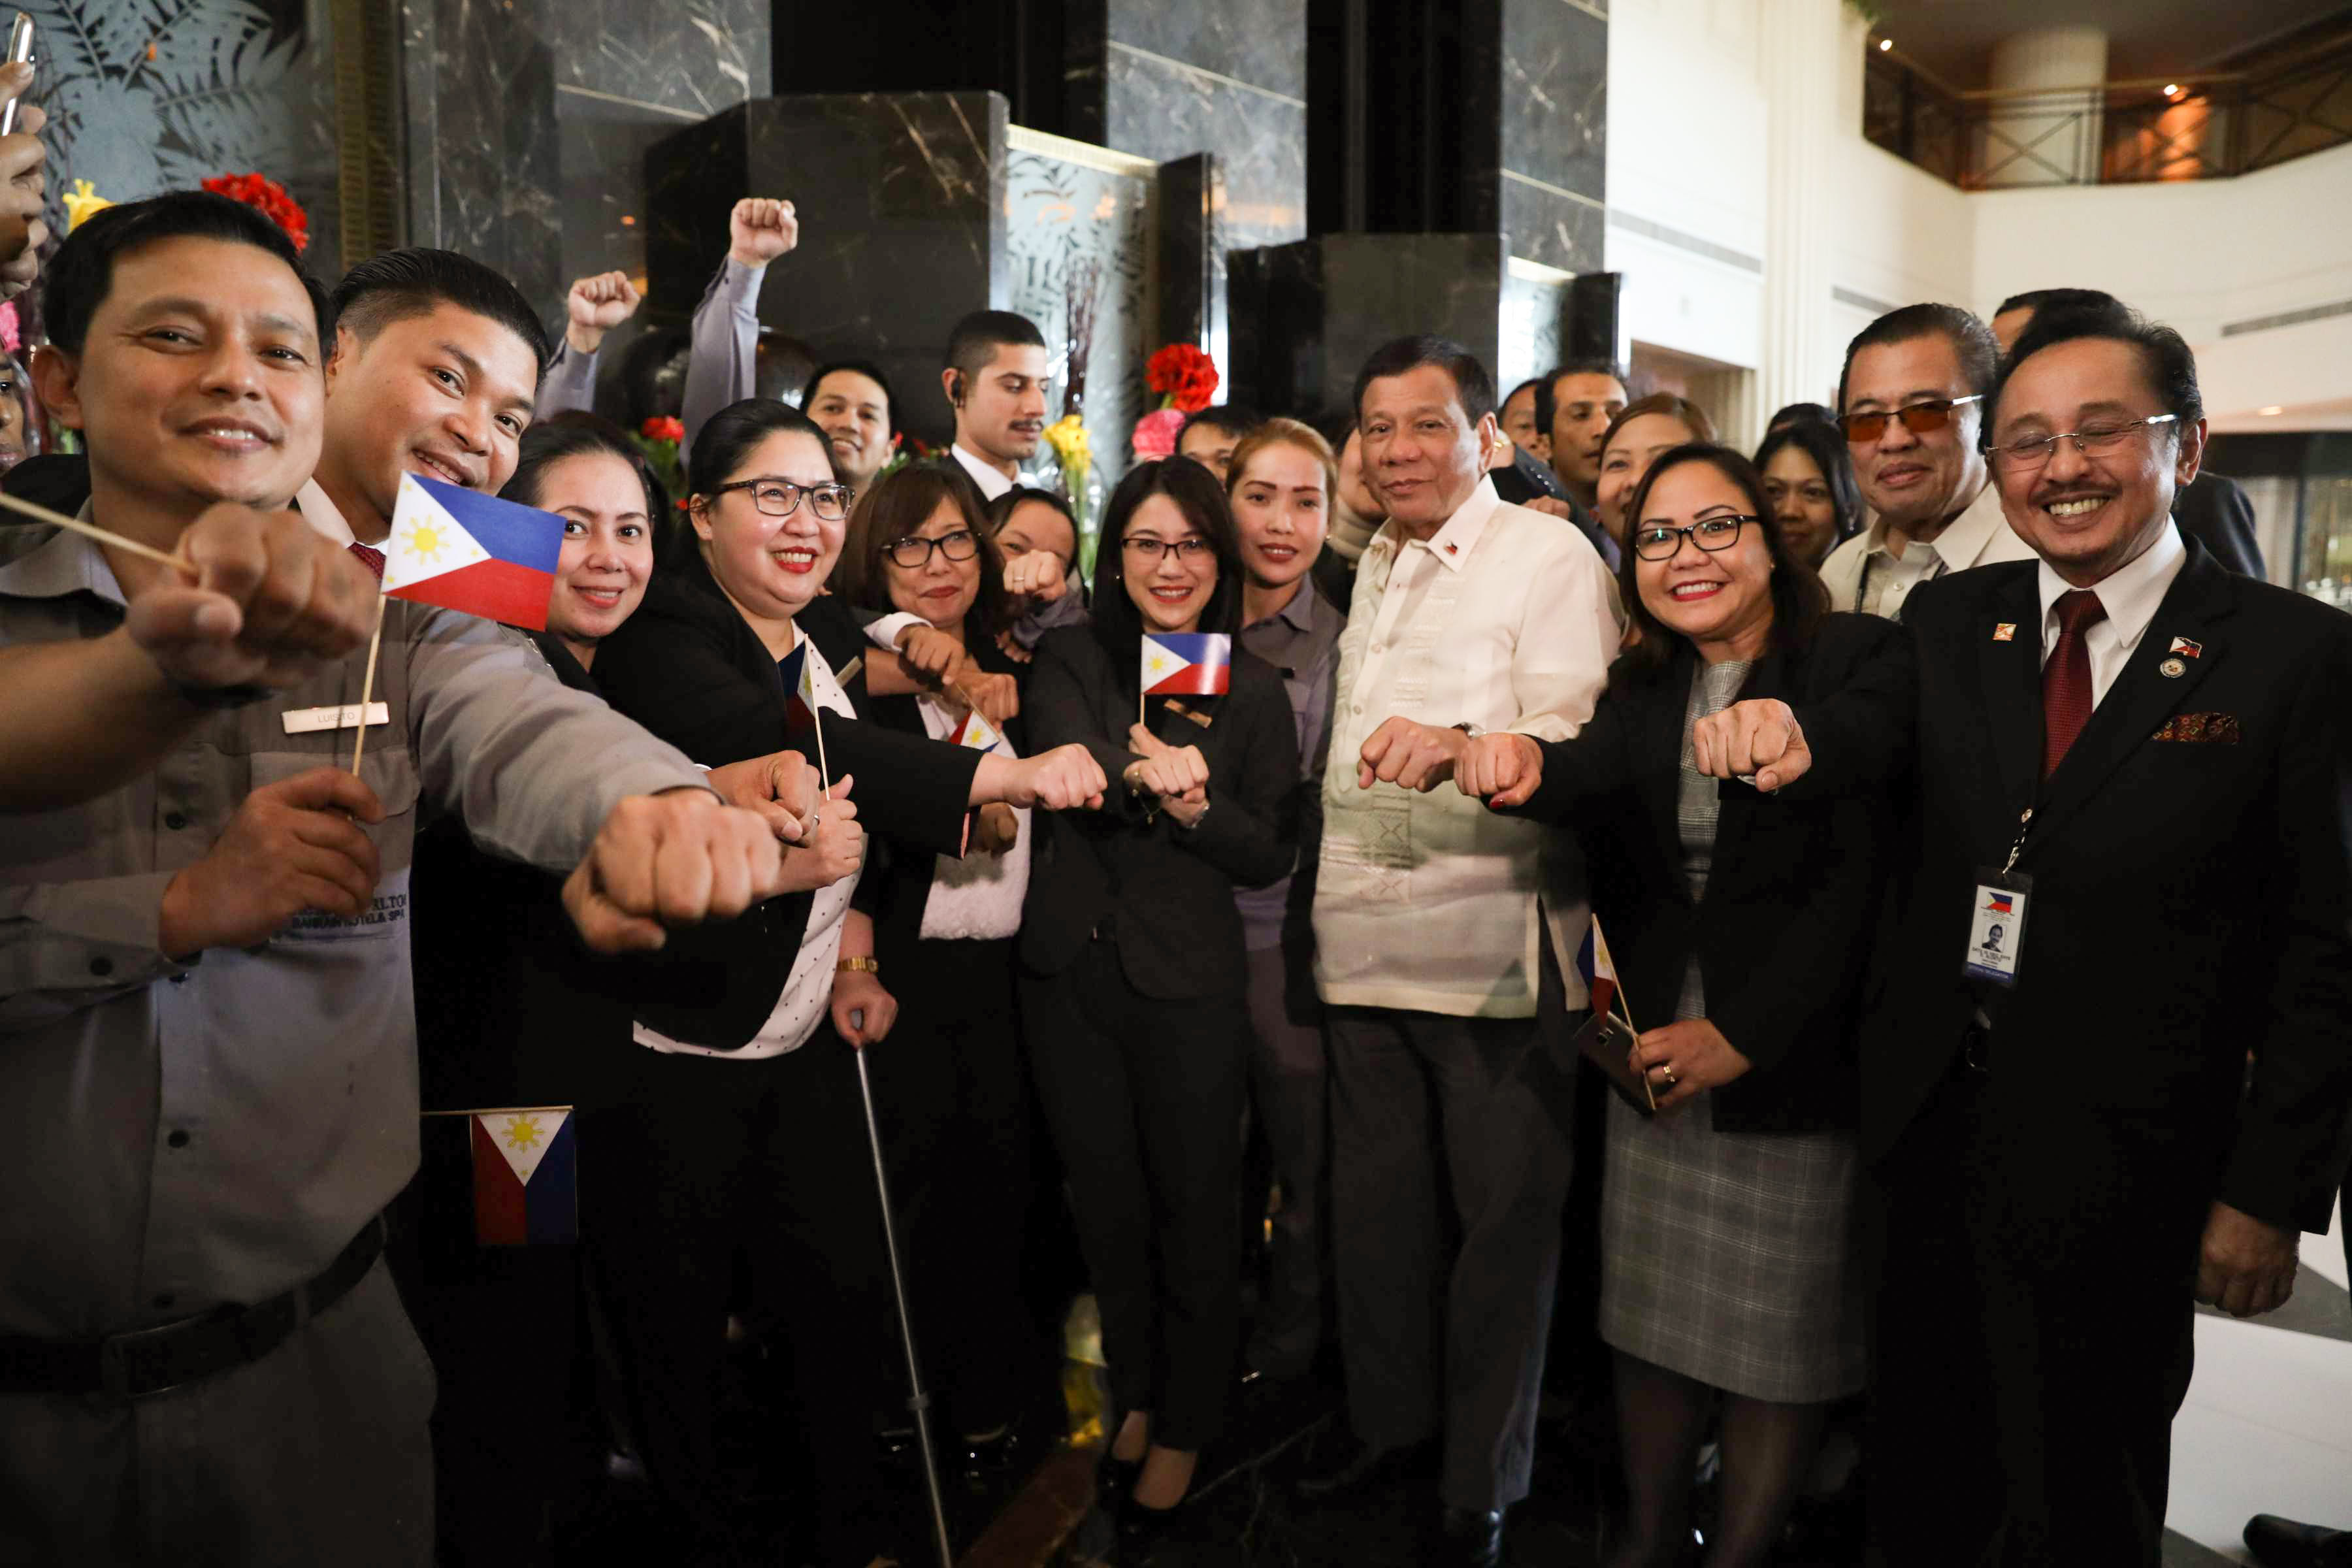 SUPERSTAR. President Rodrigo Duterte poses with the staff of the Ritz Carlton Hotel in Bahrain on April 13, 2017 where he was treated to a lunch by His Royal Highness Sheikh Ali Bin Khalifa Al Khalifa. Malacau00f1ang file photo